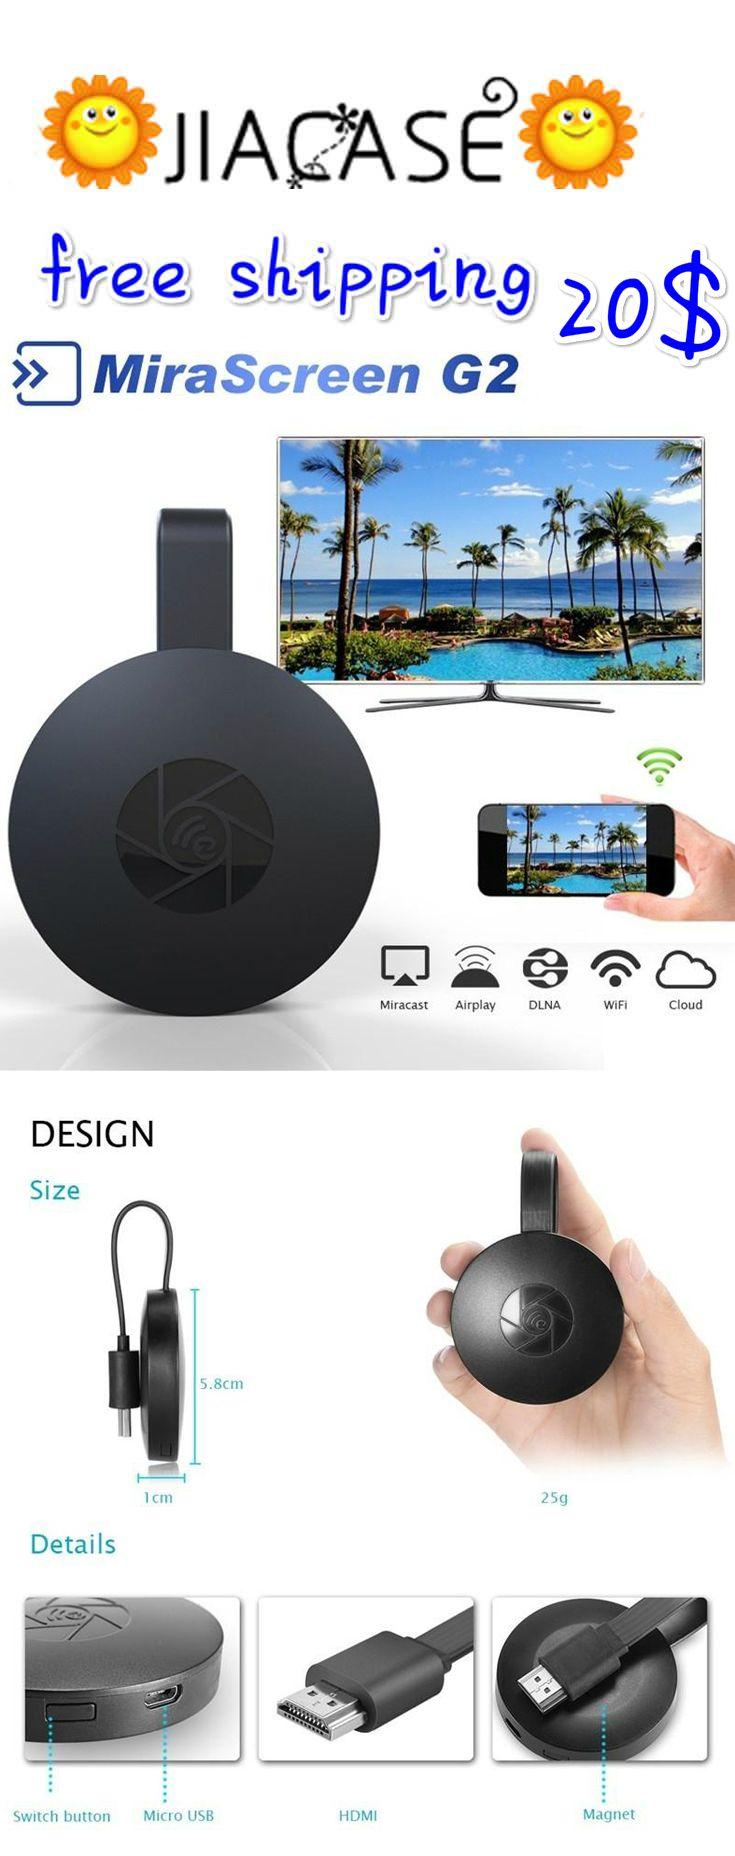 #MiraScreen G2 #Wireless #HDMI #Dongle #TV Stick 2.4G 1080P HD TV #Dongle #Plug And Play Chromecast Google Chromecast